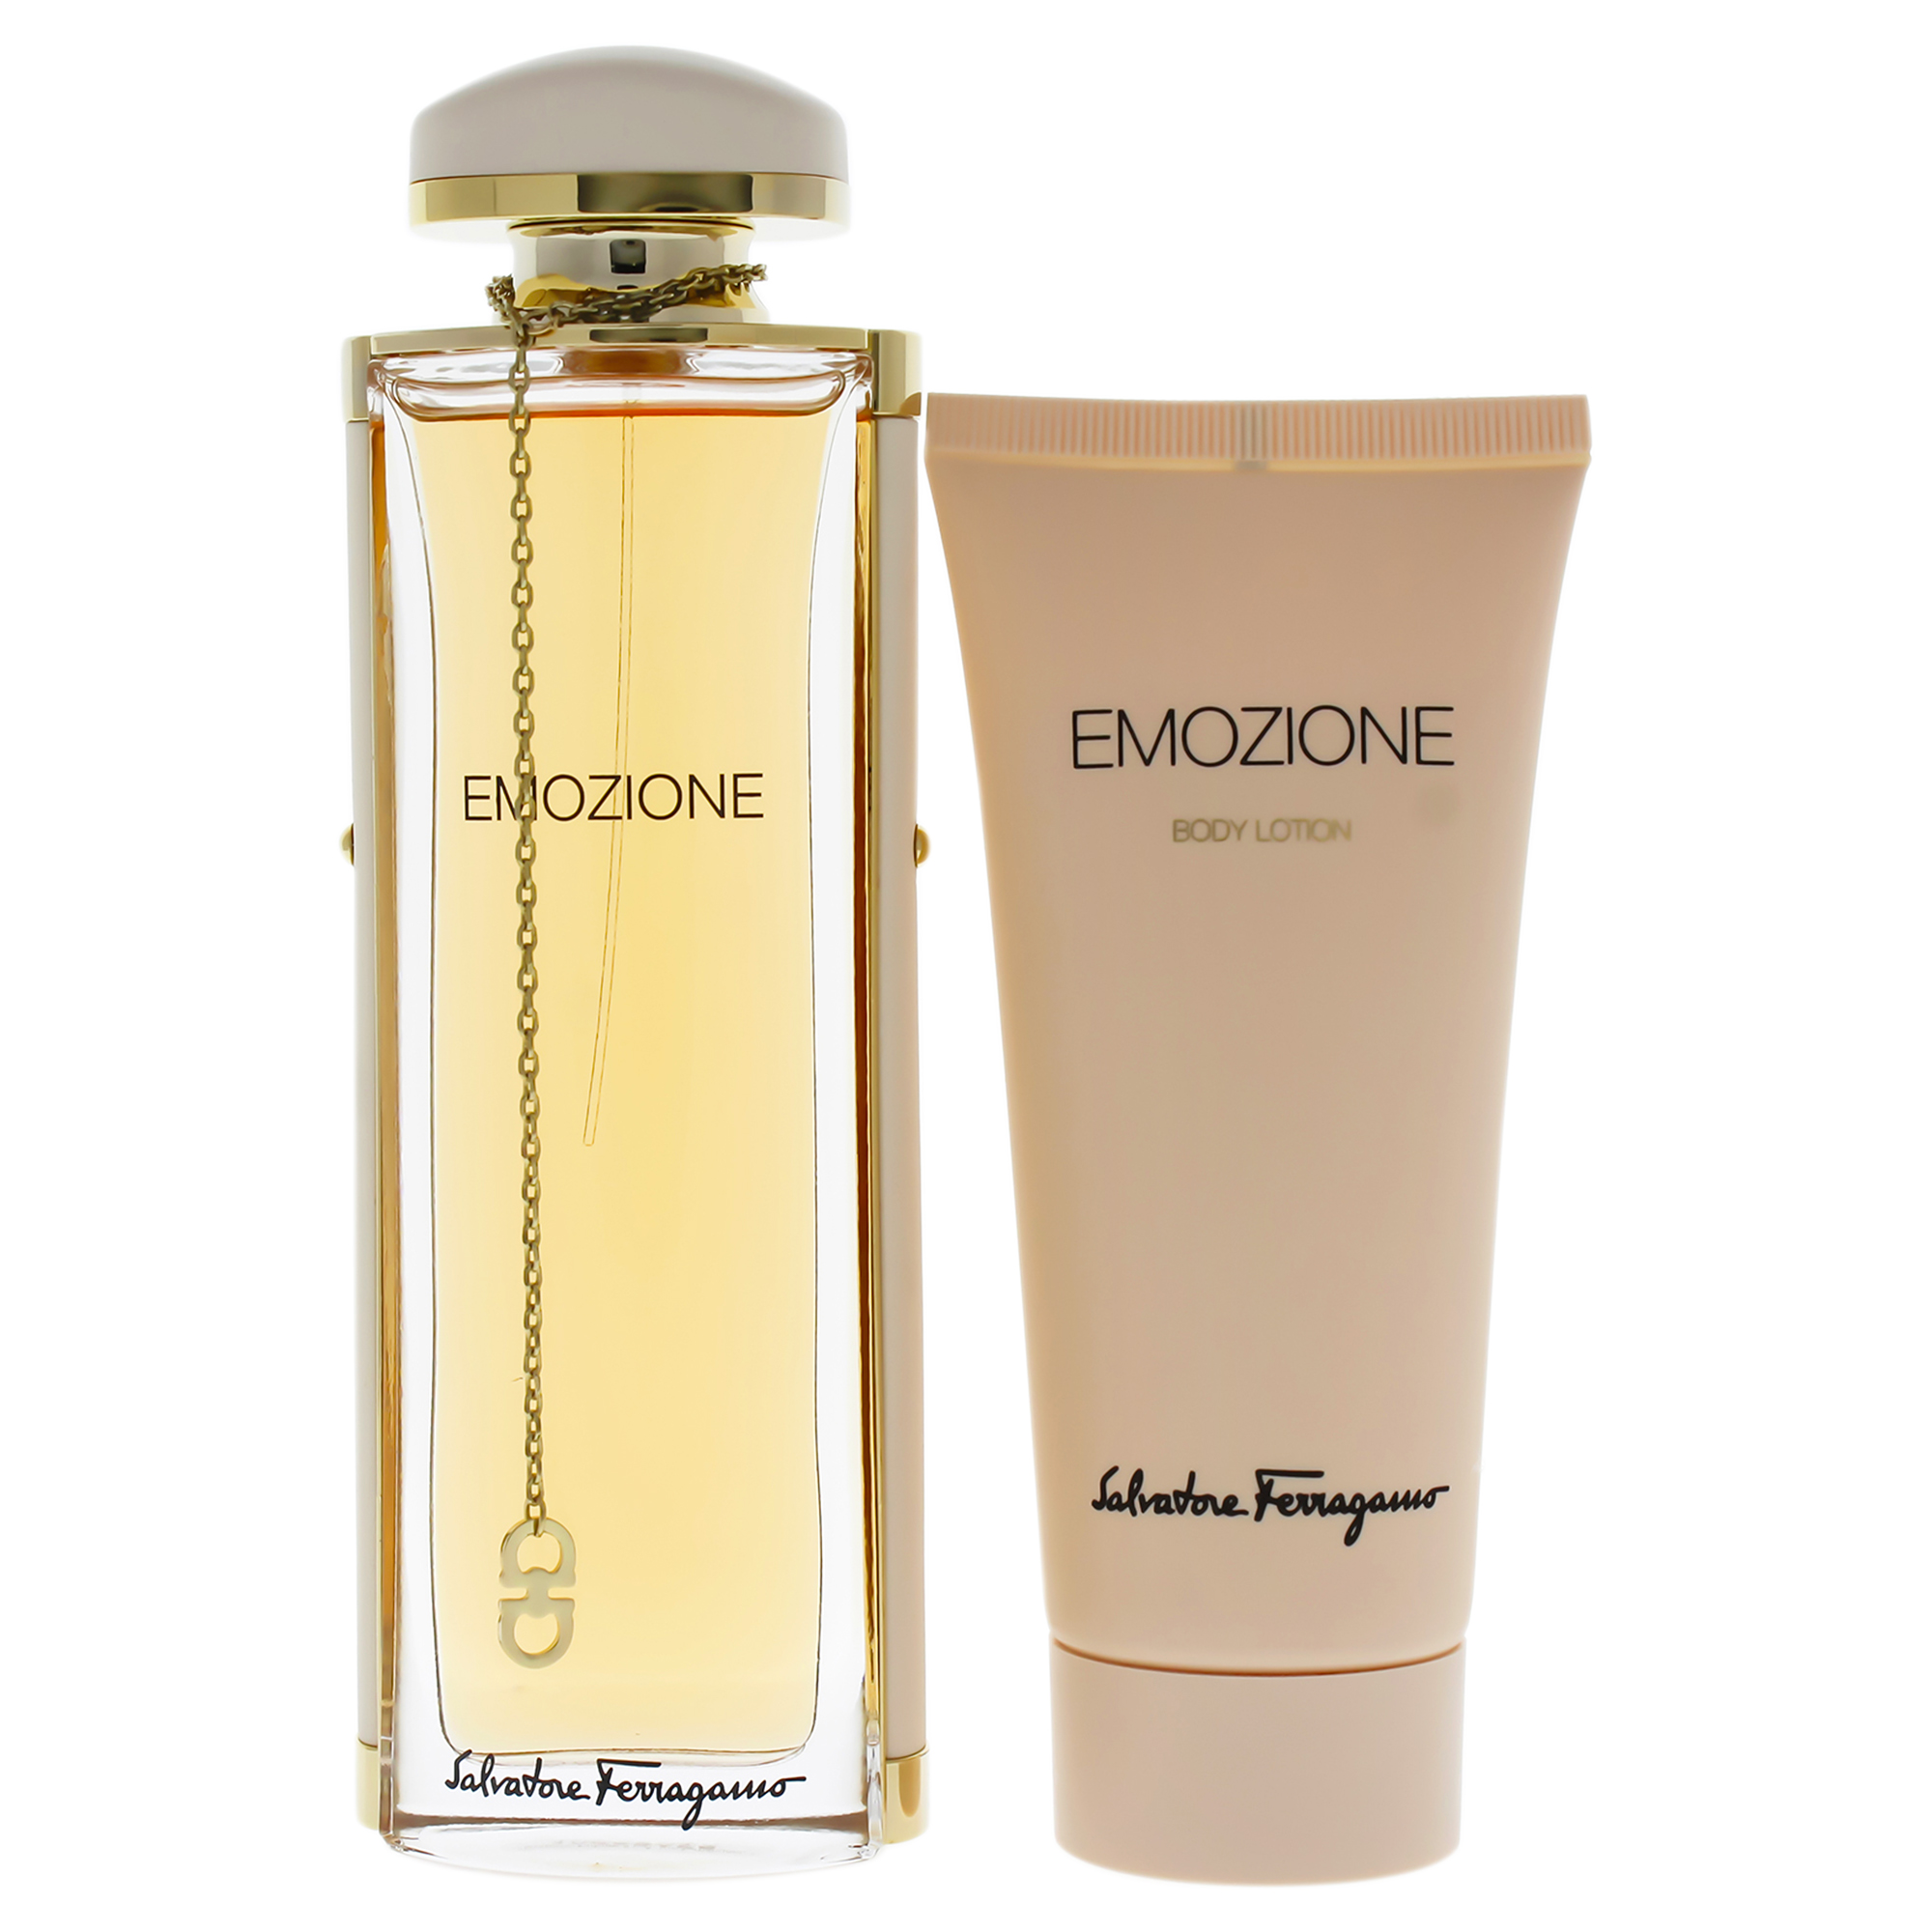 d48674bfb5aa8 Salvatore Ferragamo Emozione 3.1oz Eau De Parfum Spray, 3.4oz Body Lotion 2  Pc Gift Set - Walmart.com